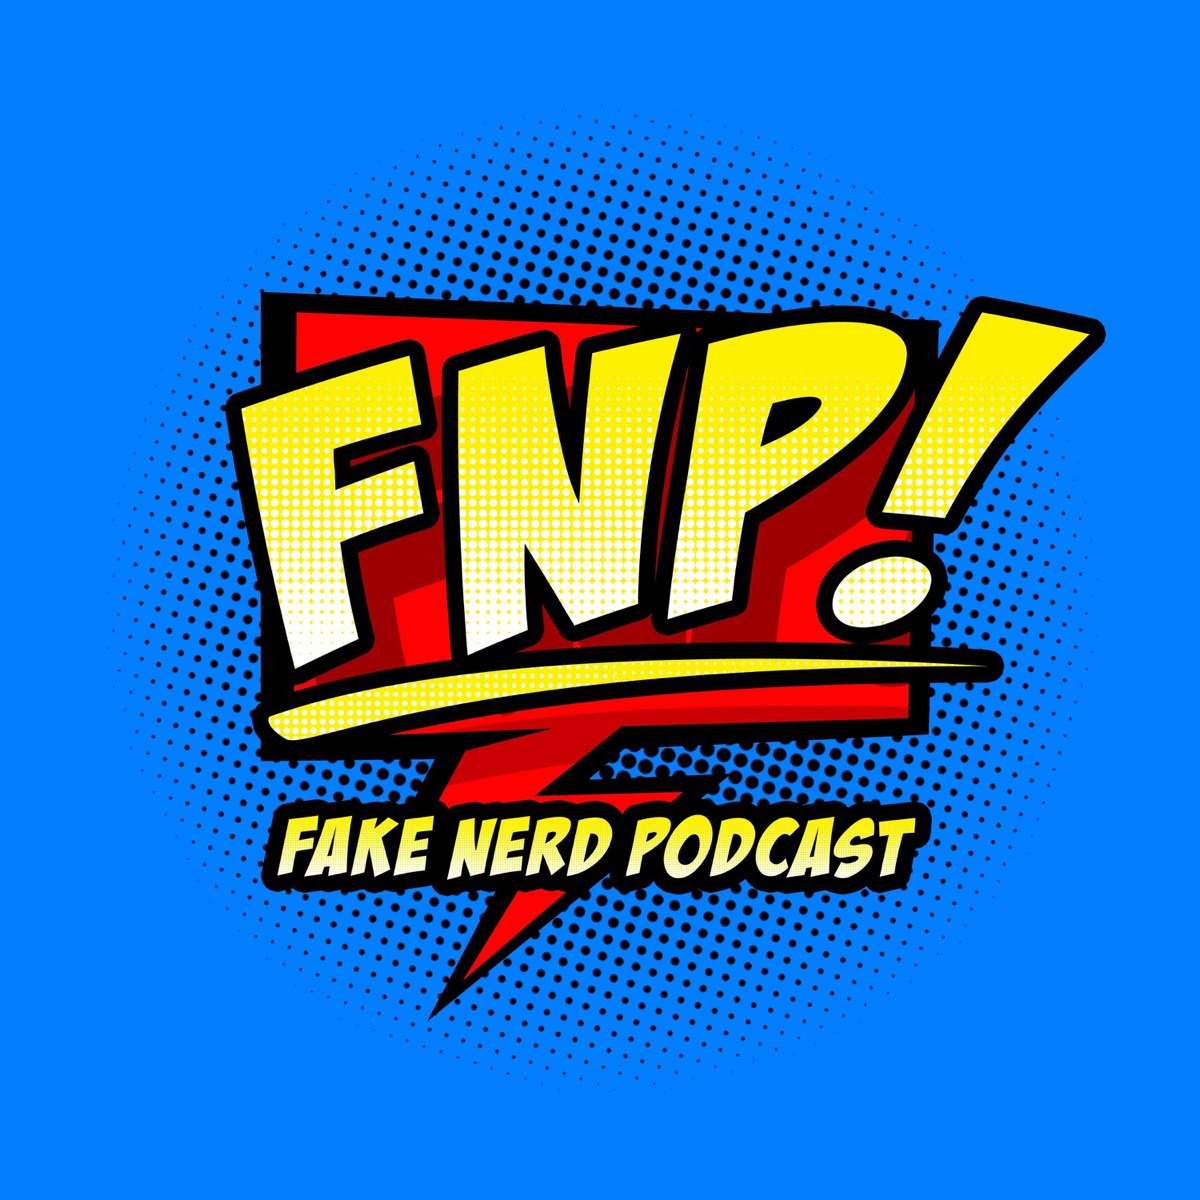 Fake Nerd Podcast